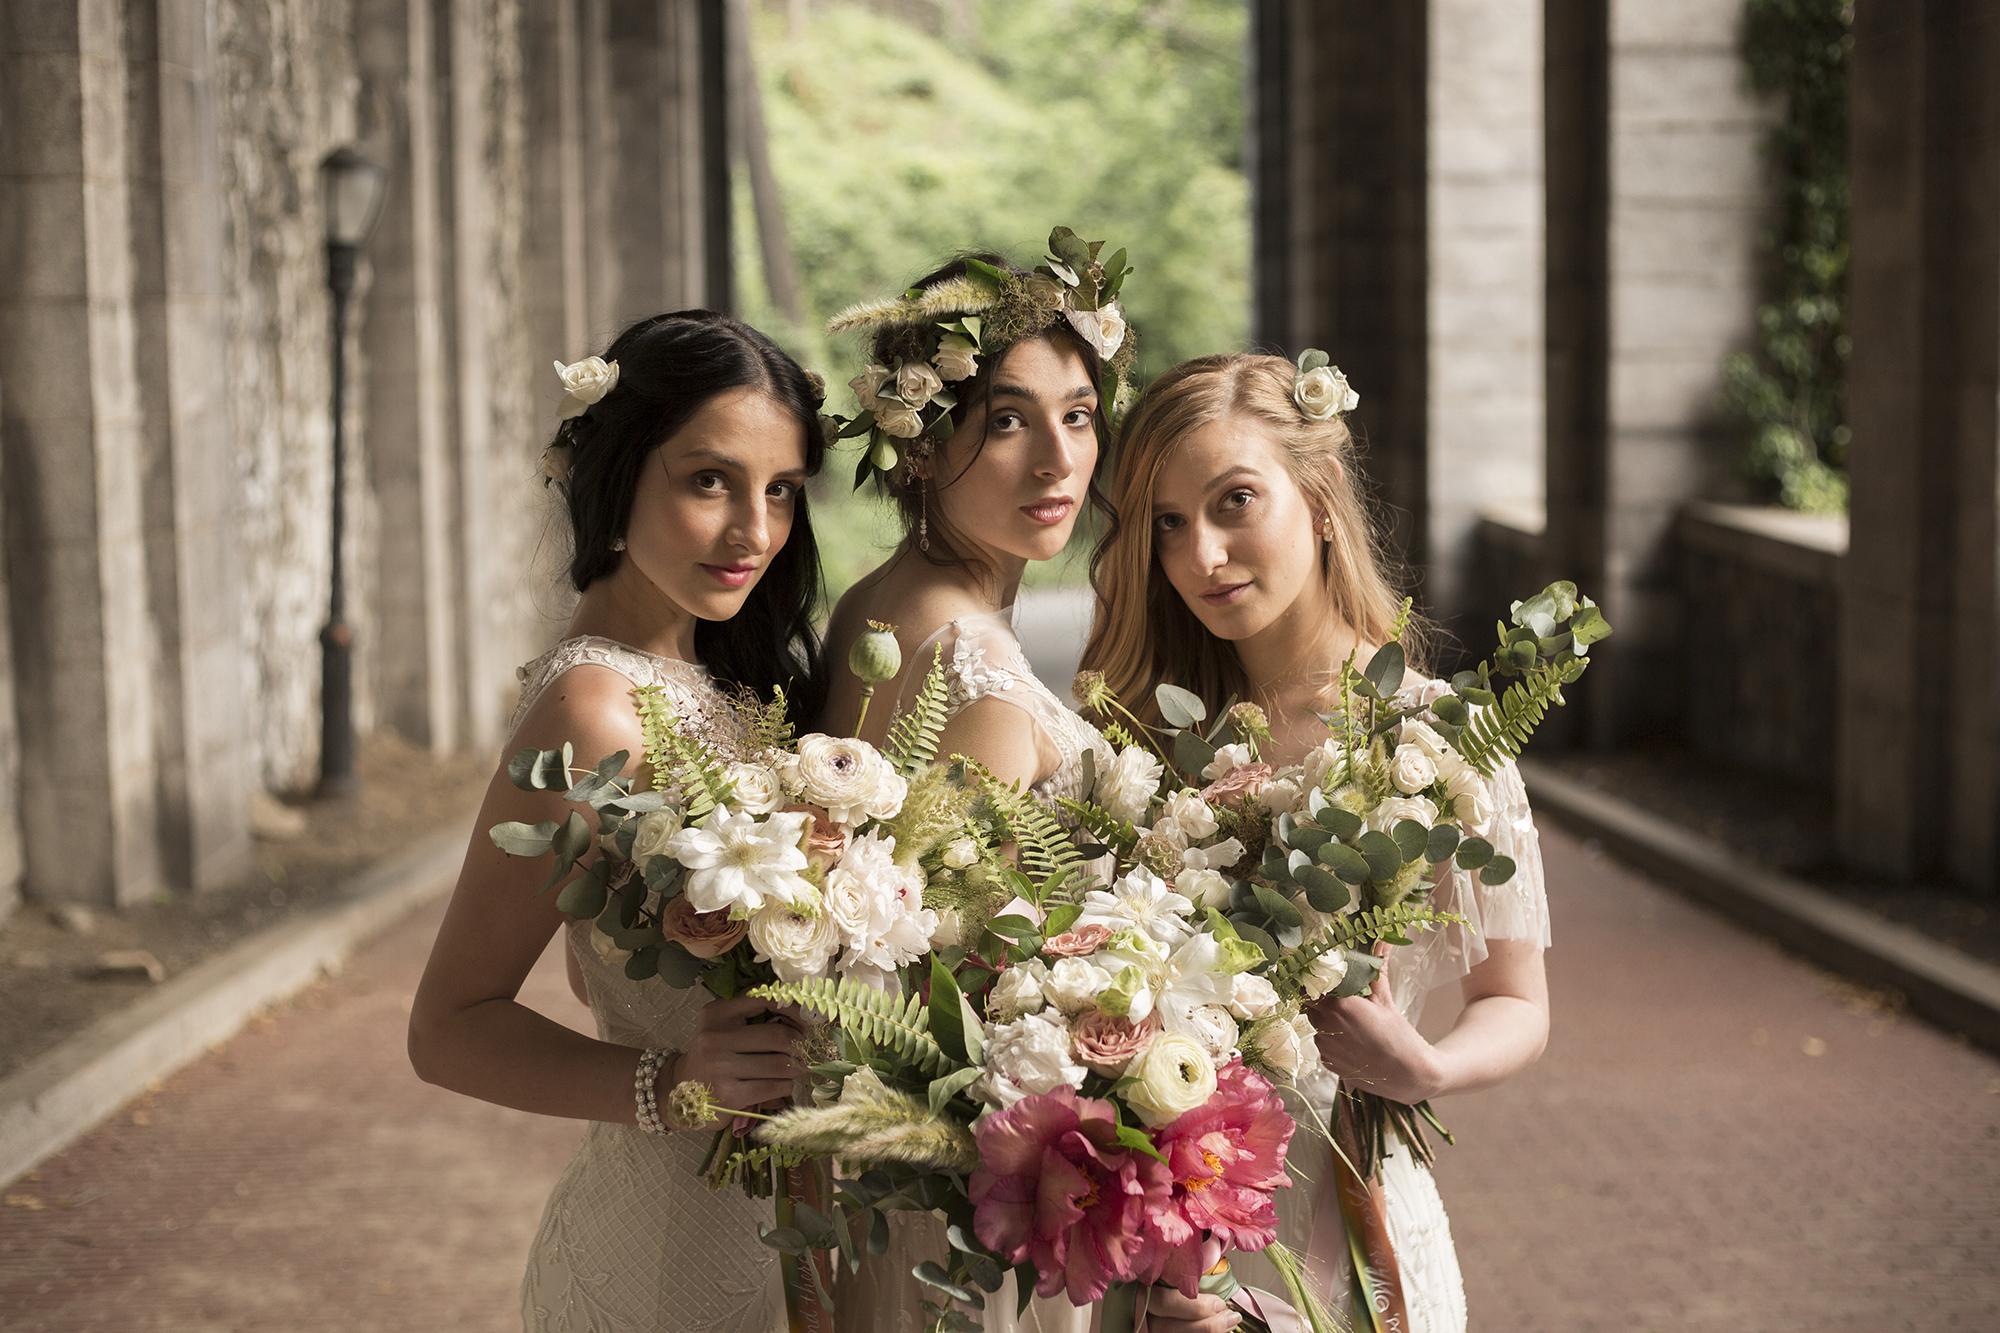 Midsummer Night's Dream themed wedding editorial shoot | www.chavelli.com